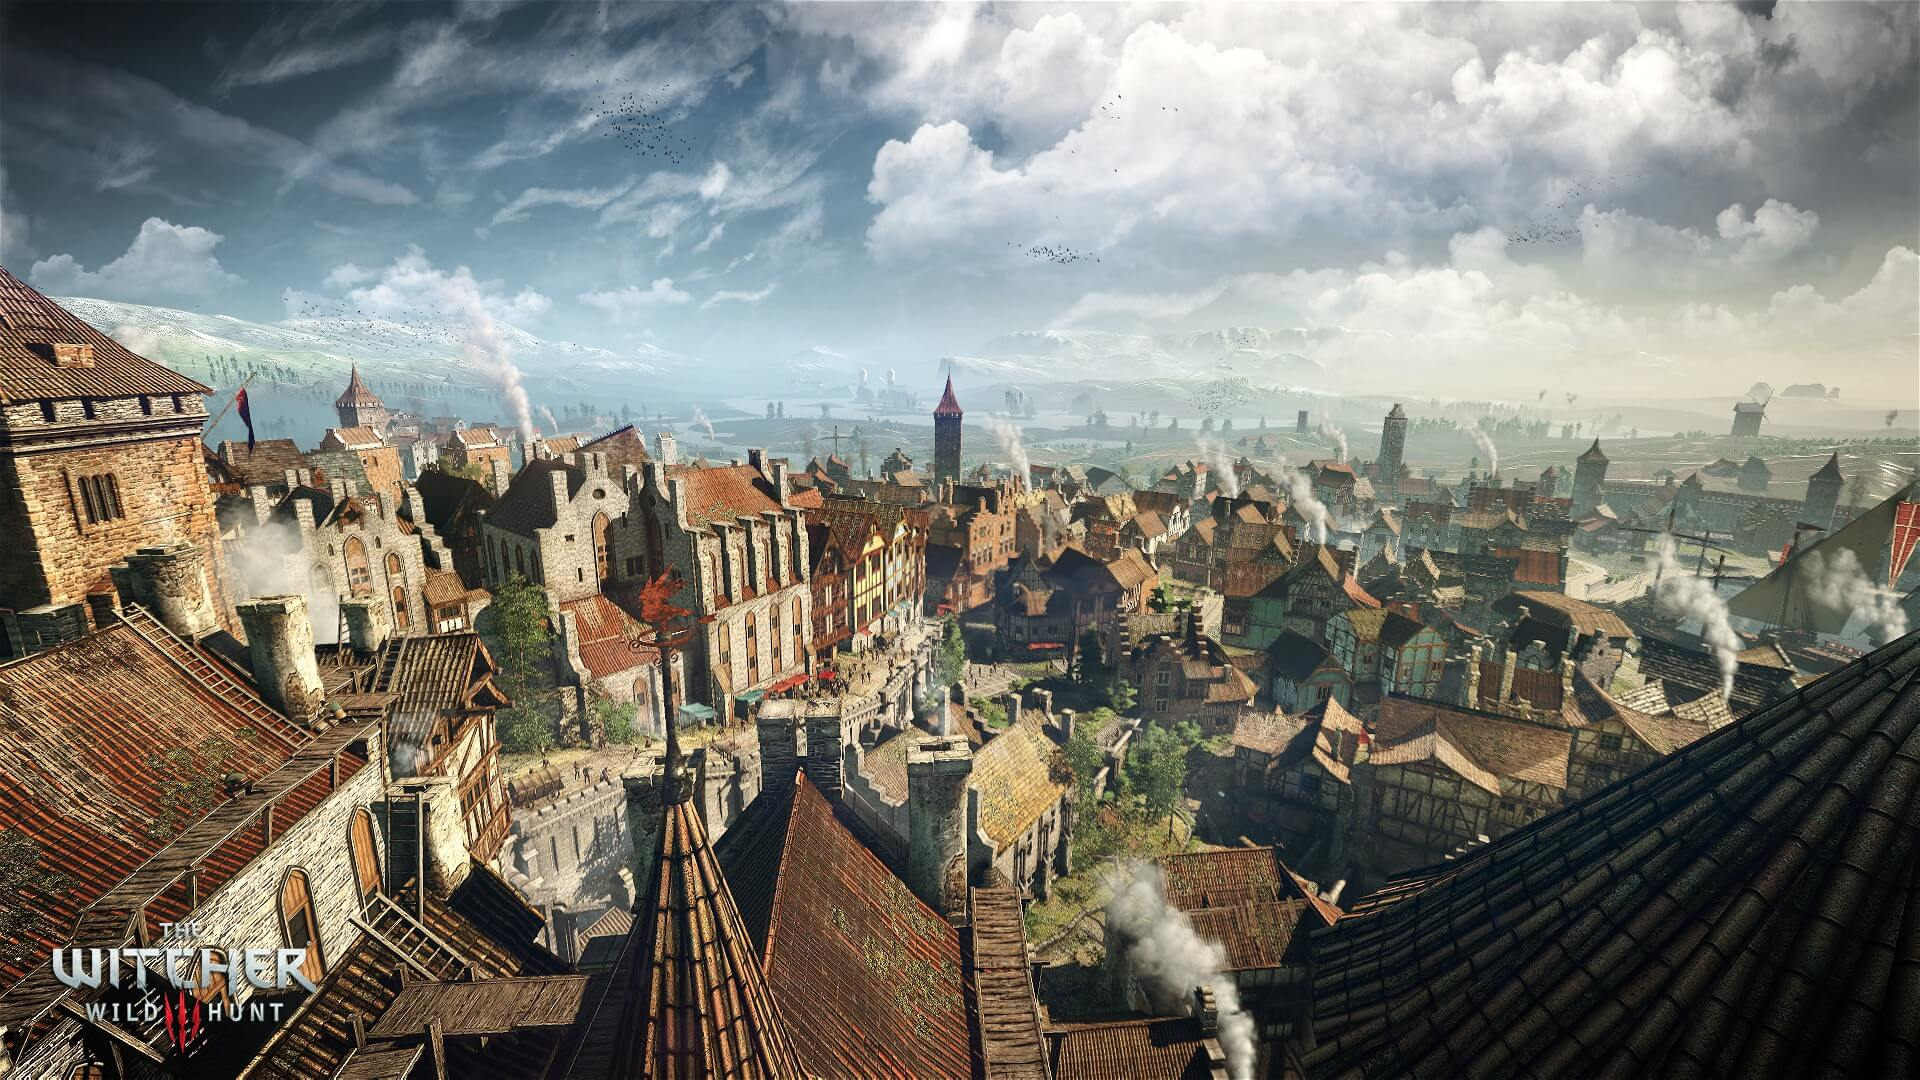 The Witcher 3: Wild Hunt City Screenshot